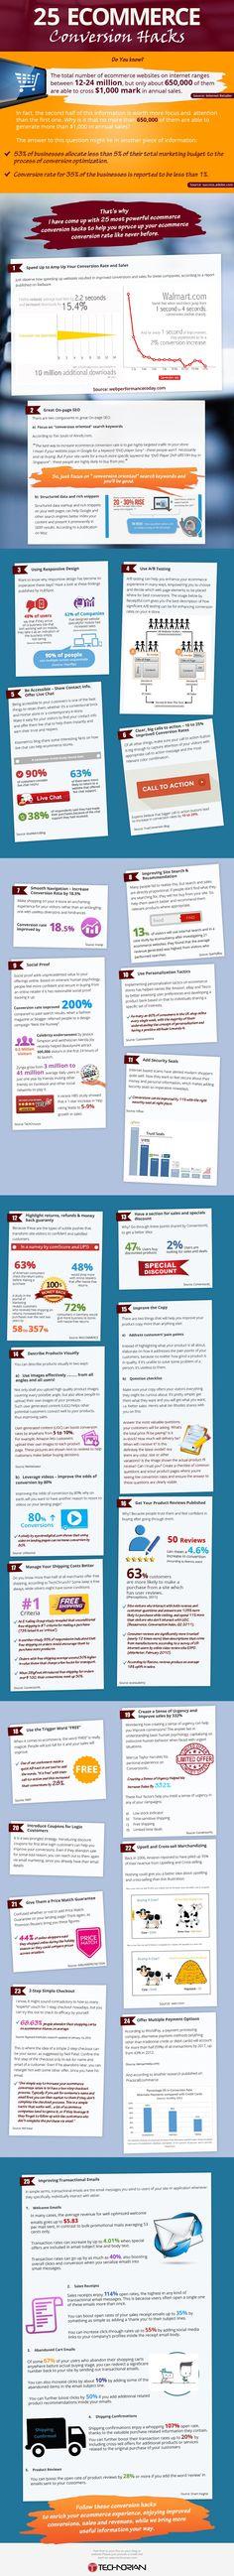 25 Ecommerce Conversion Optimization Hacks [Infographic] #eCommerce #conversionoptimization #infographic